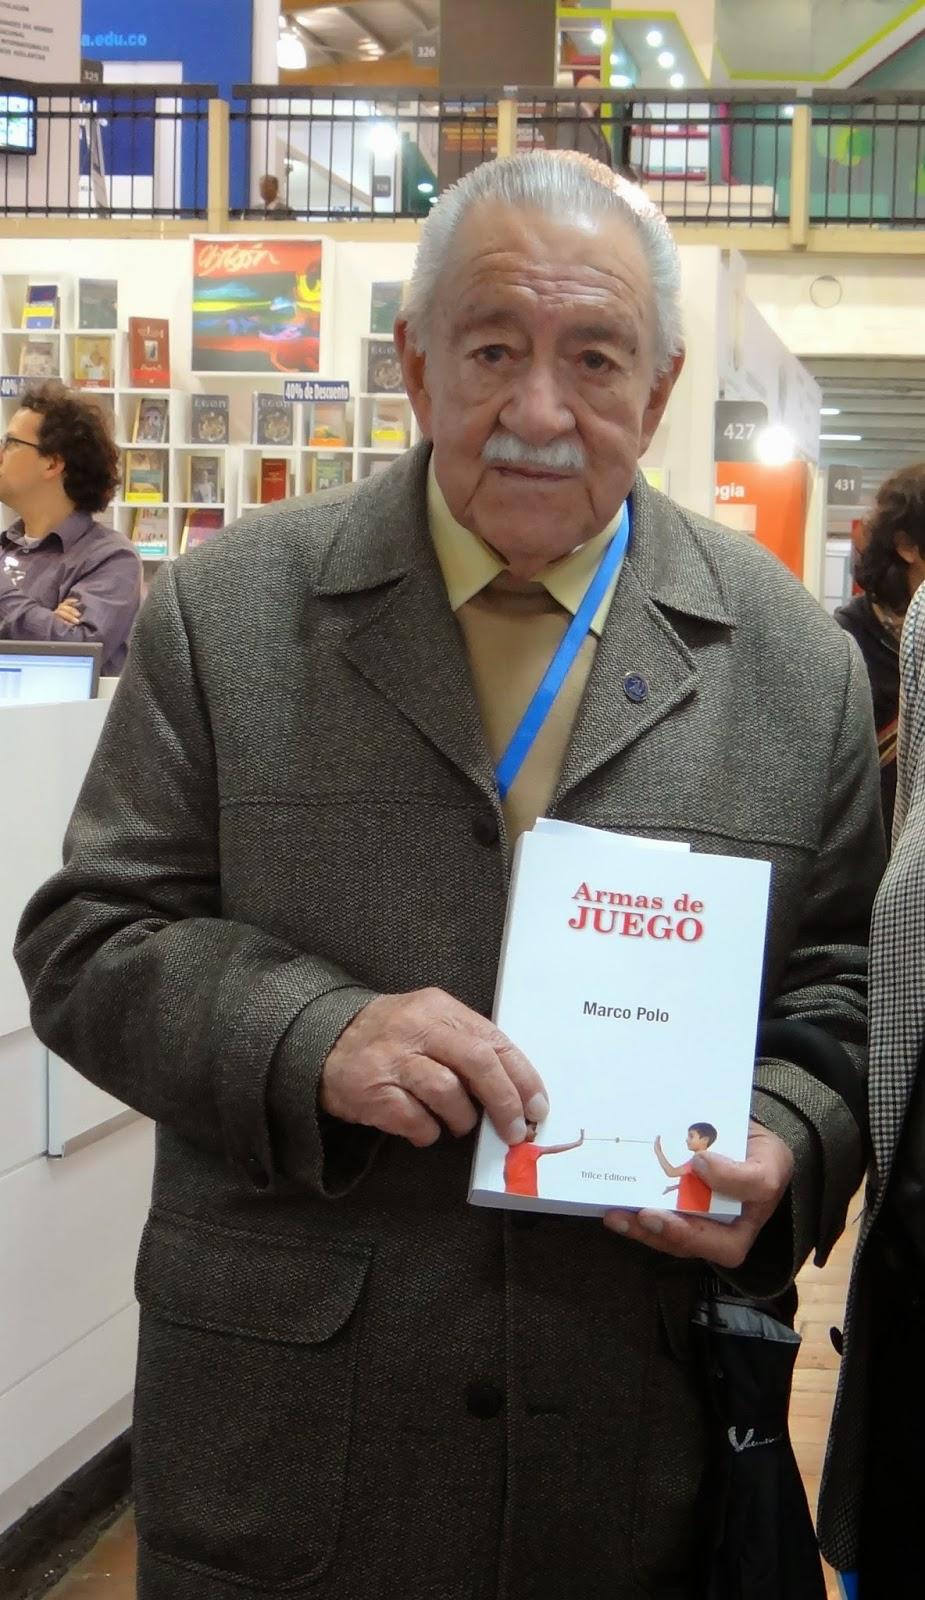 Fernando Soto Aparicio Obras Fernando Soto Aparicio